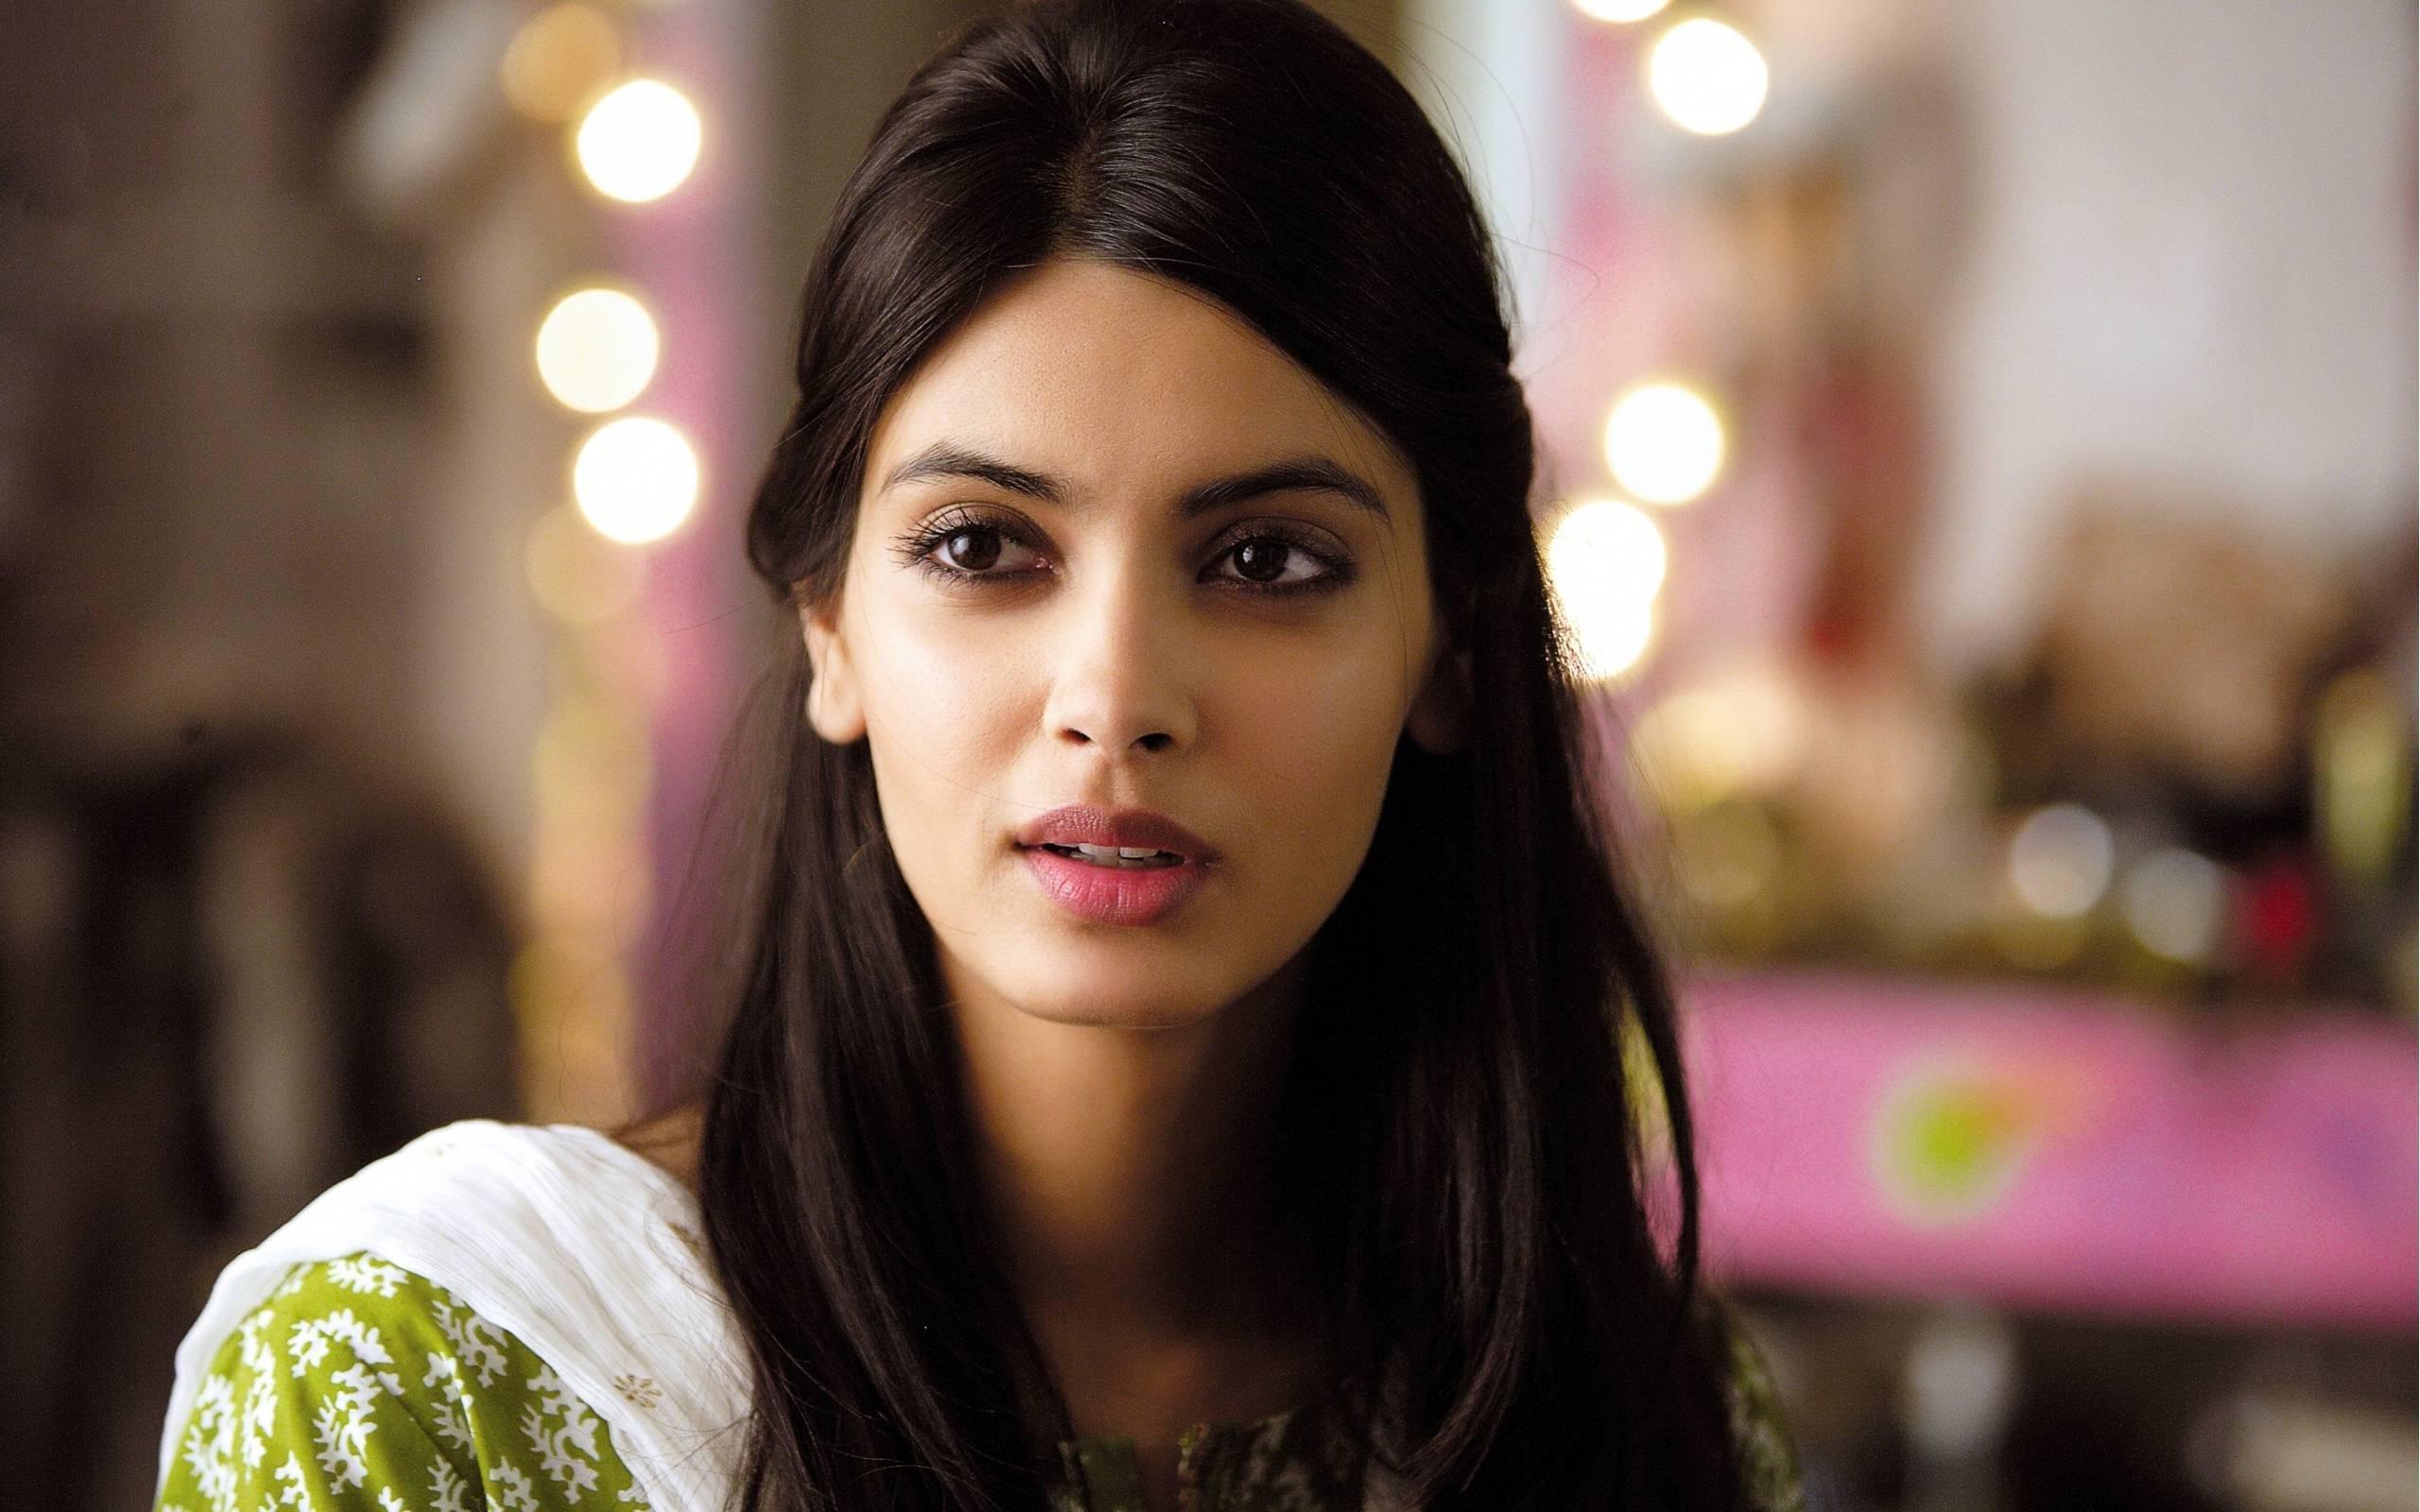 Diana penty gorgeous hd indian celebrities 4k wallpapers - Indian ladies wallpaper ...